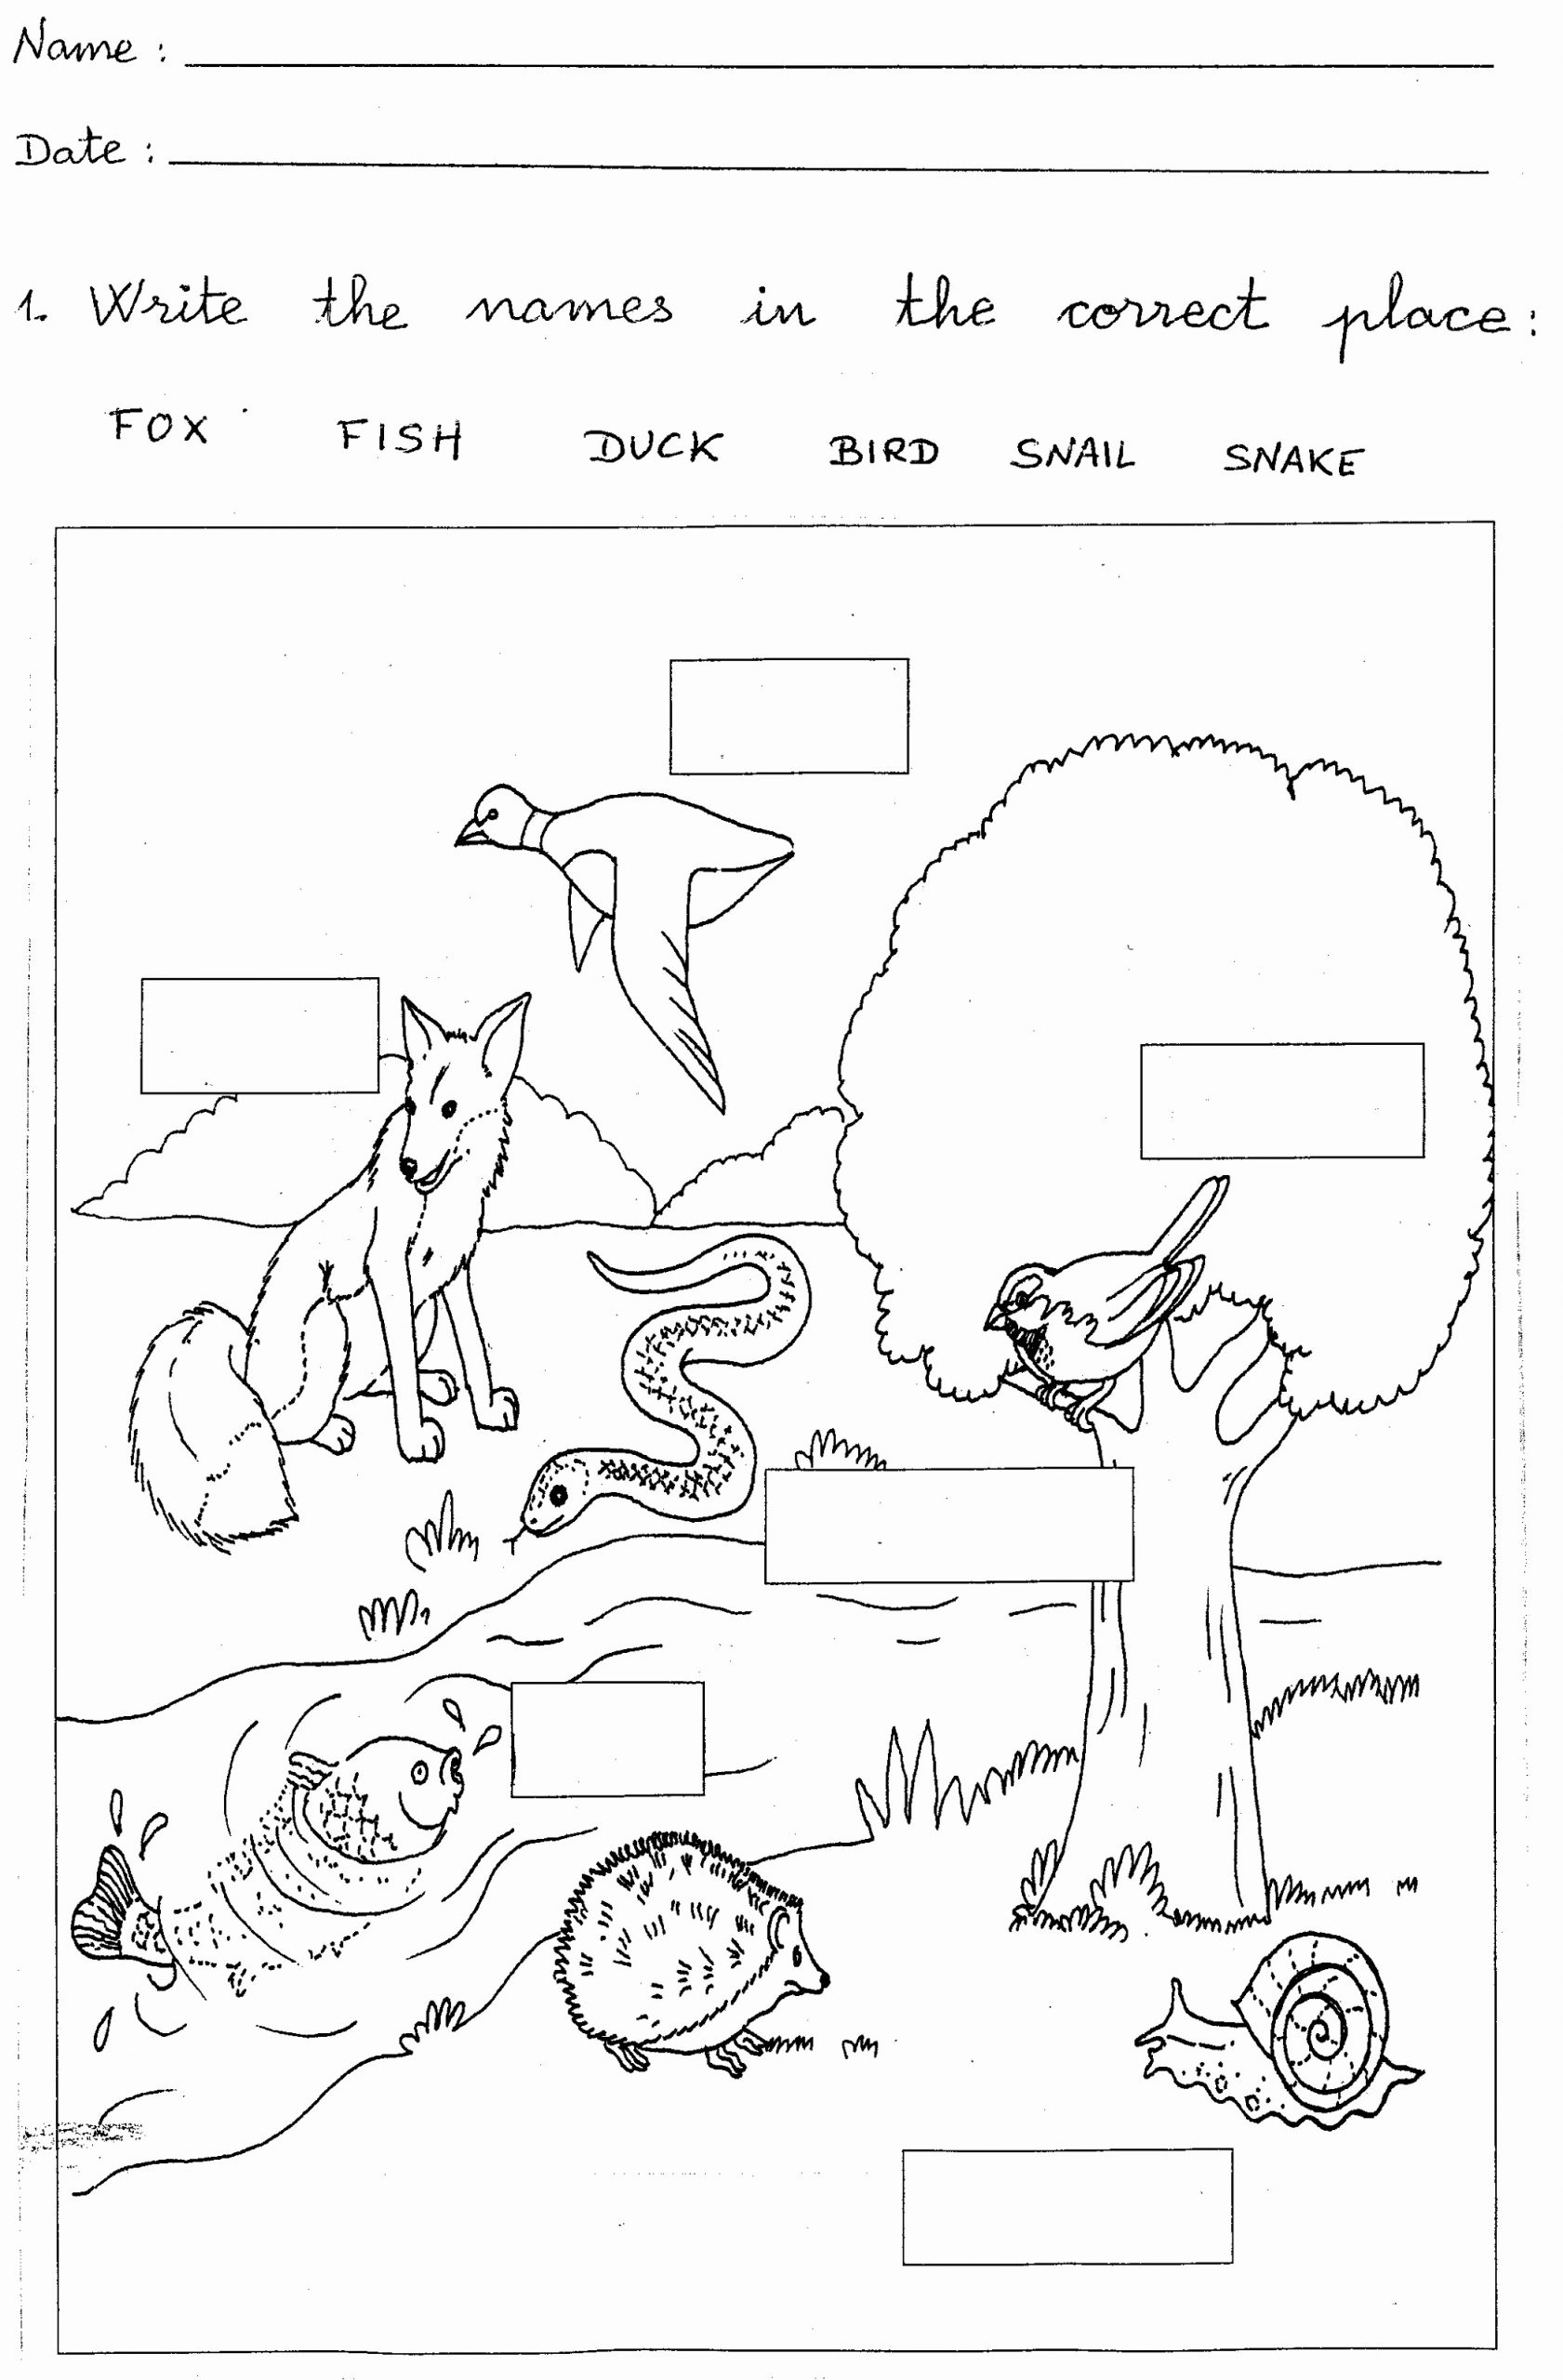 Science Worksheet 1st Grade Best Of 1st Grade Worksheets to Print